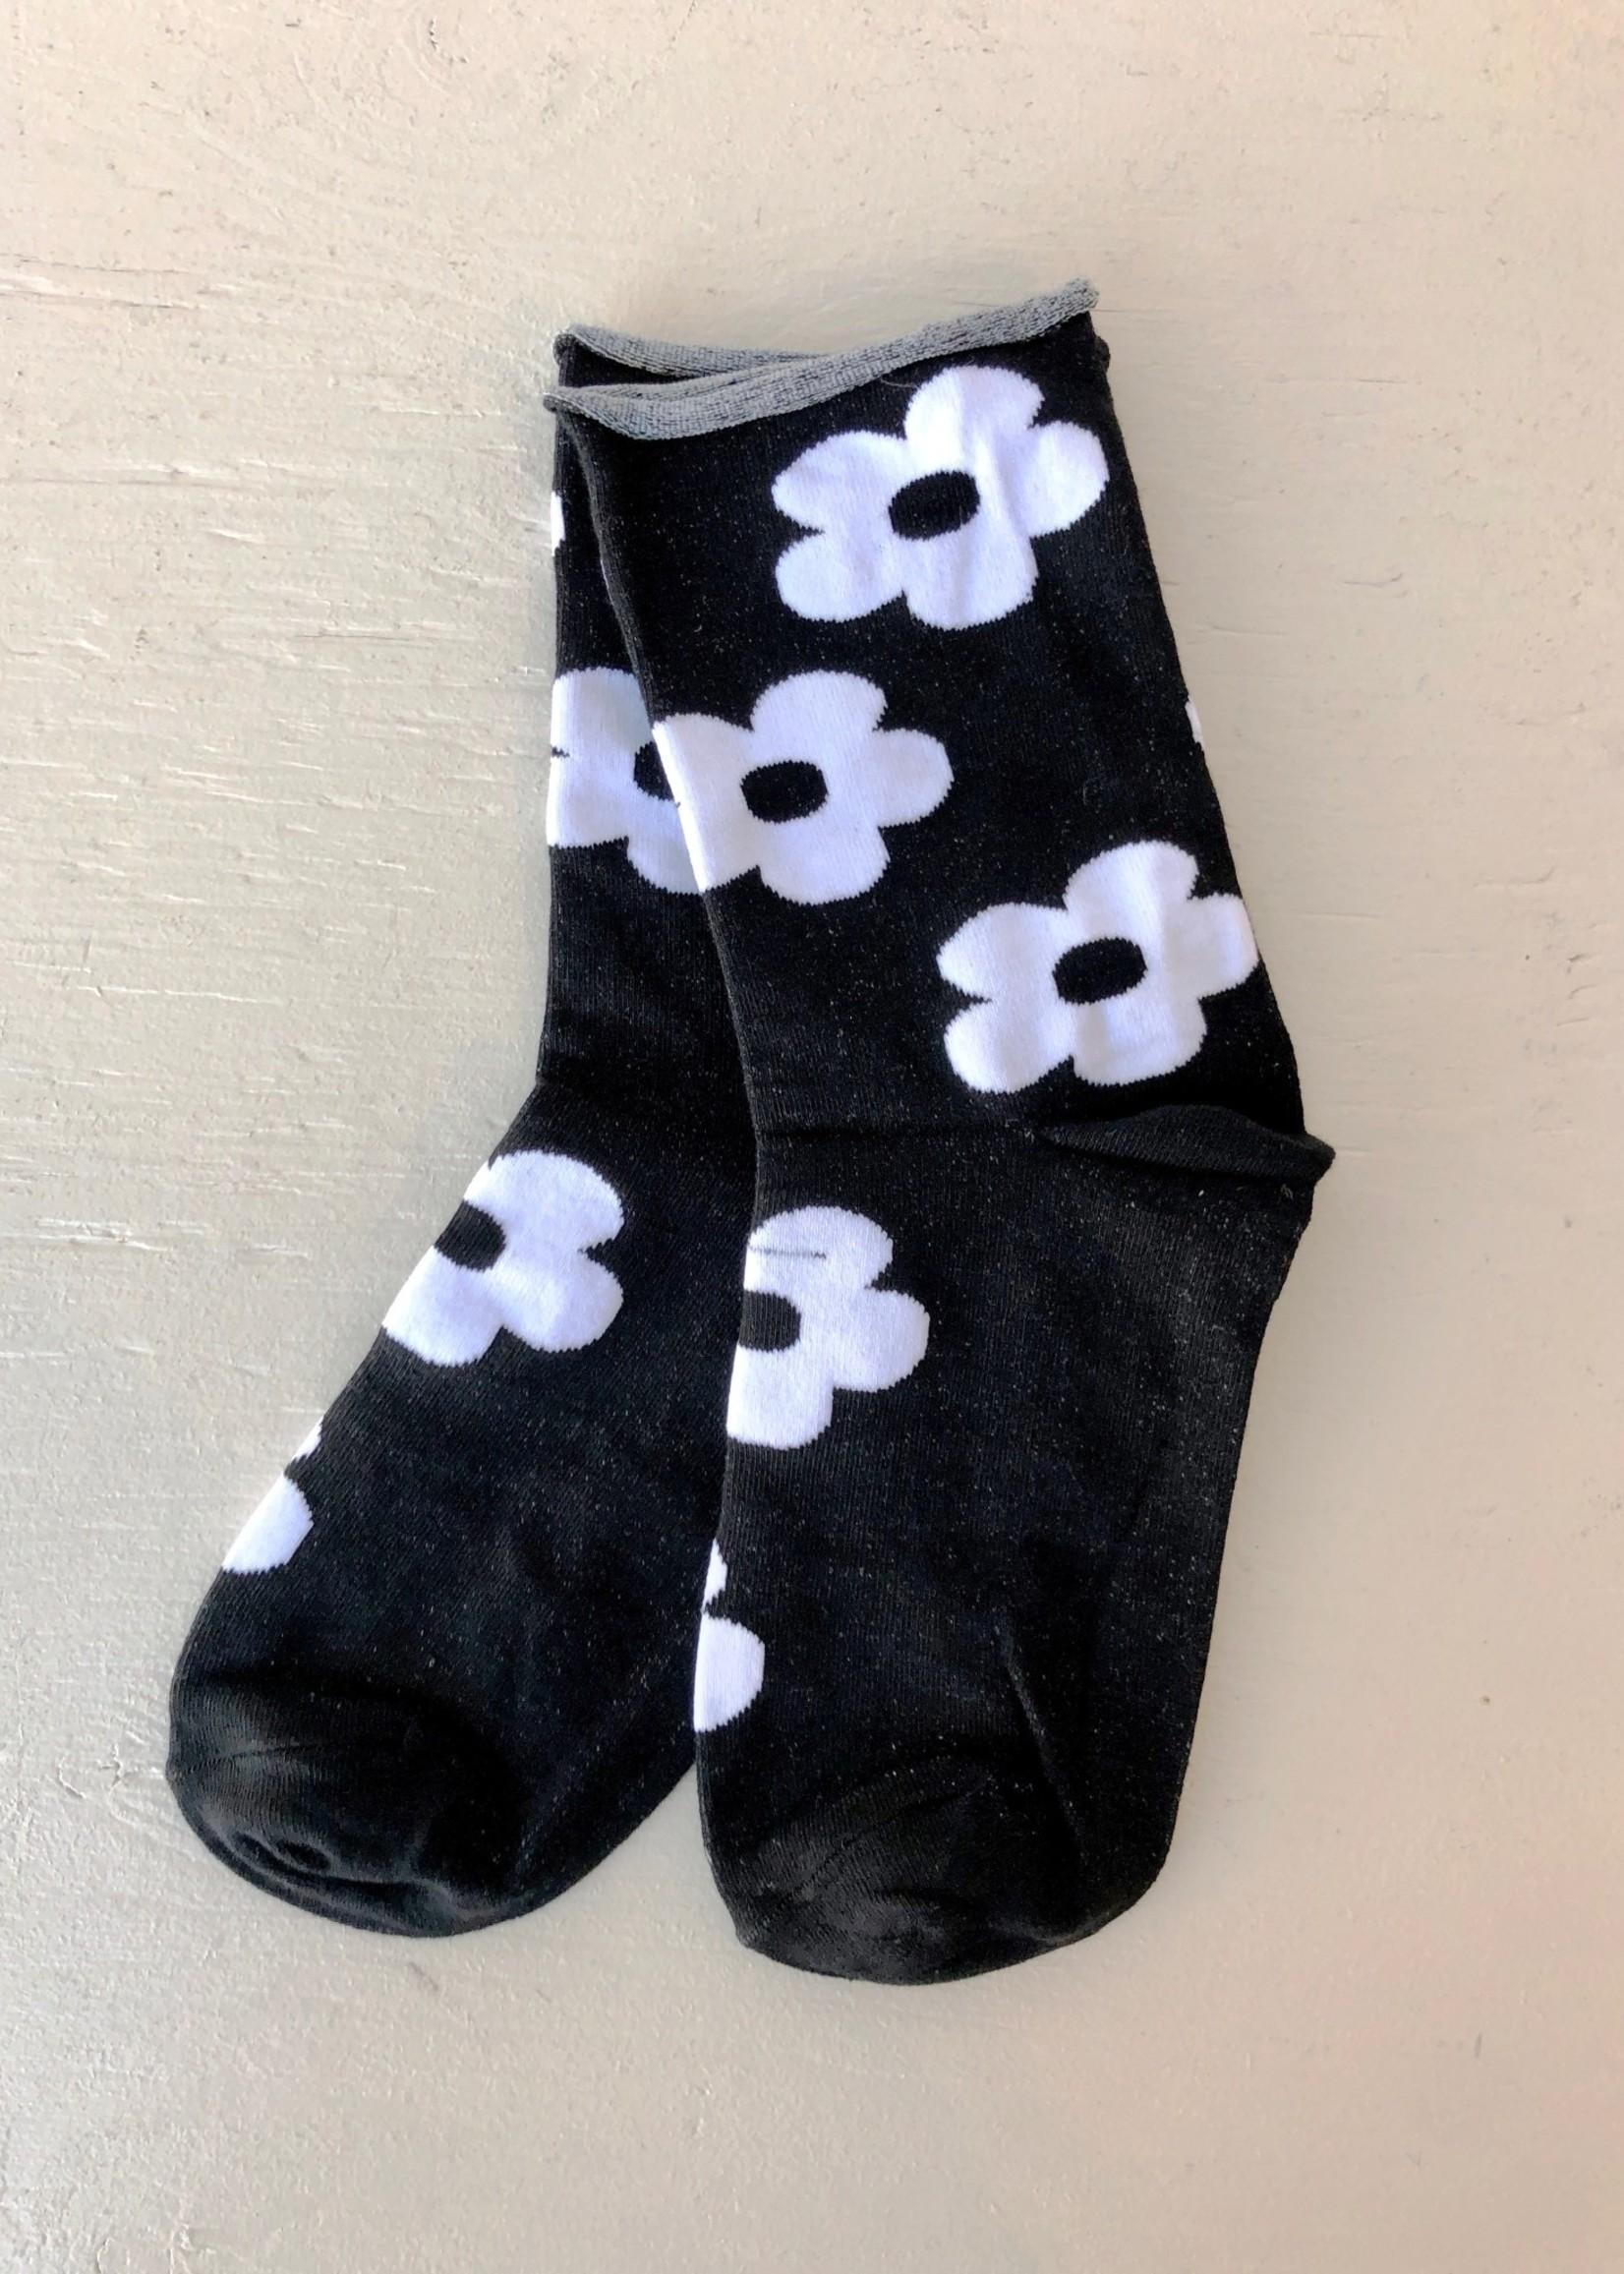 Annex Vintage Flower Socks by Annex Vintage